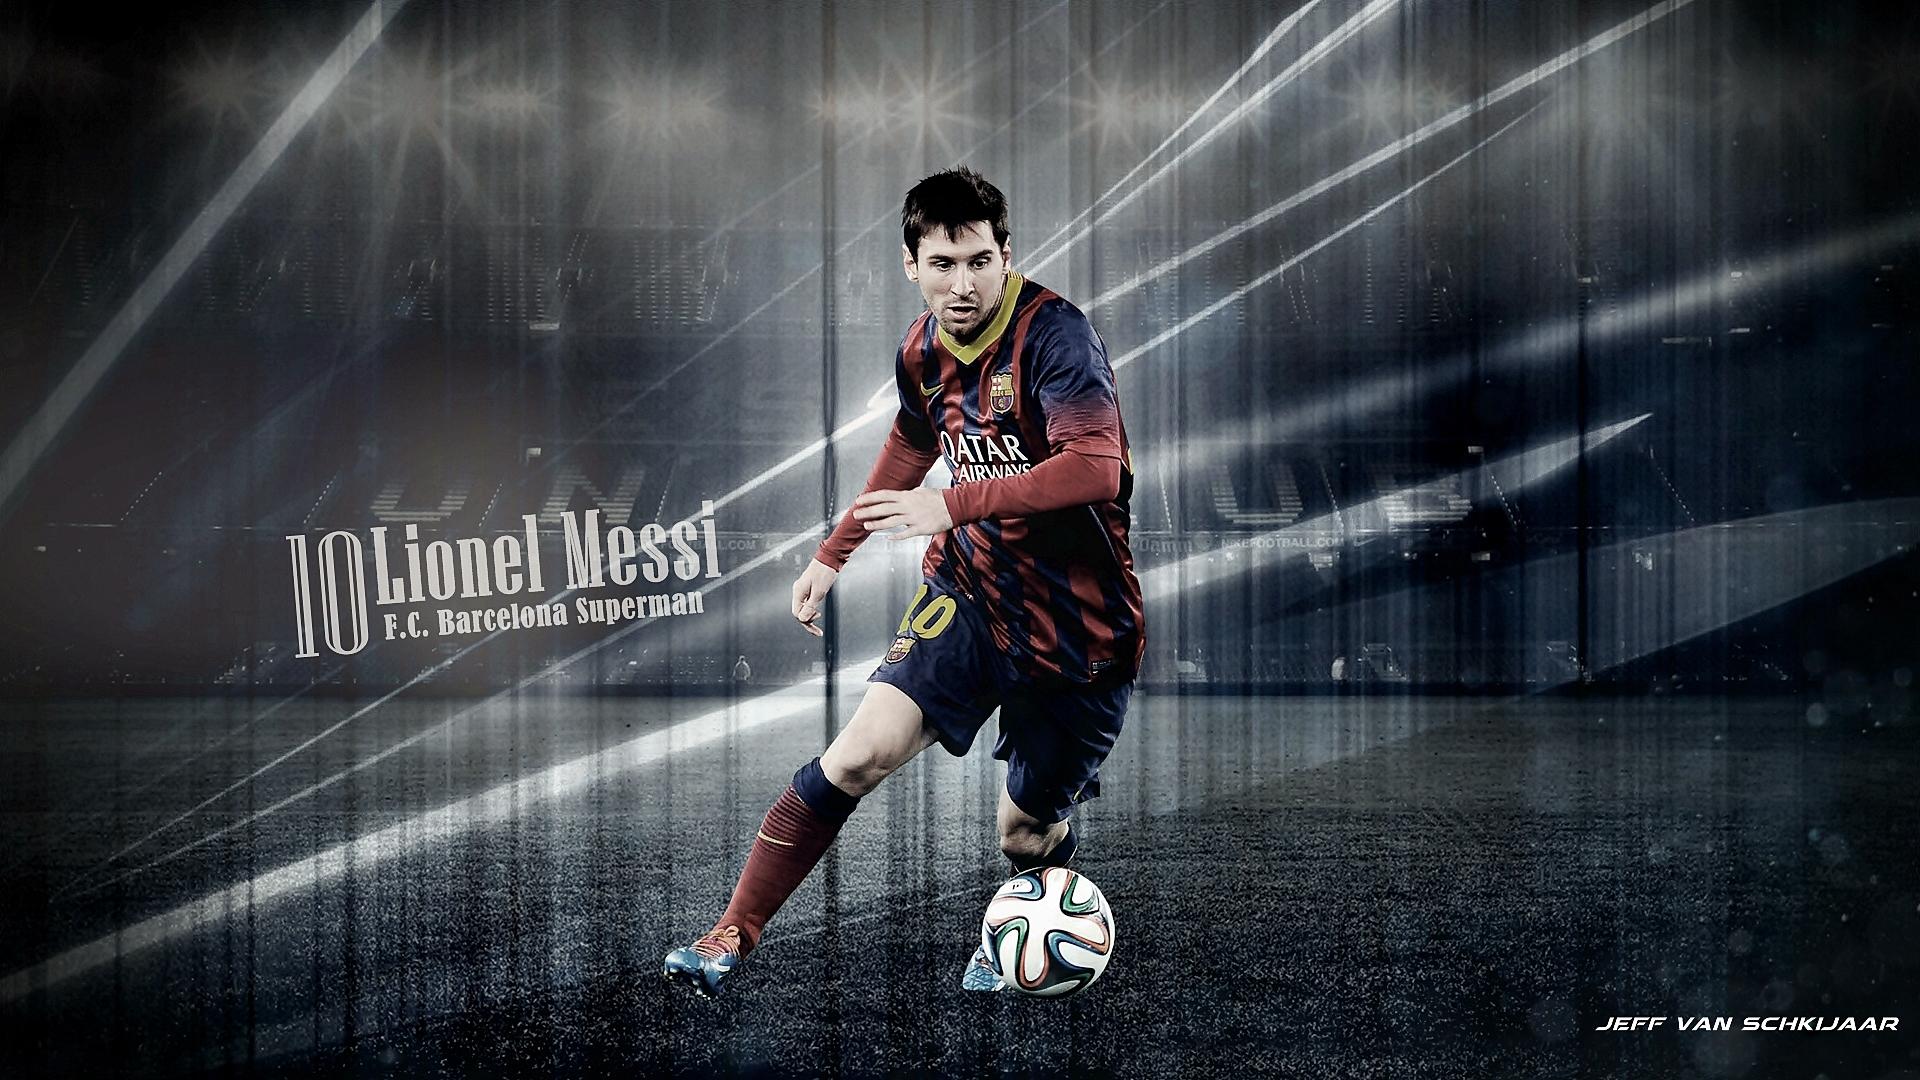 Lionel Messi Barcelona Wallpaper HD Windows 12644 Wallpaper Cool 1920x1080